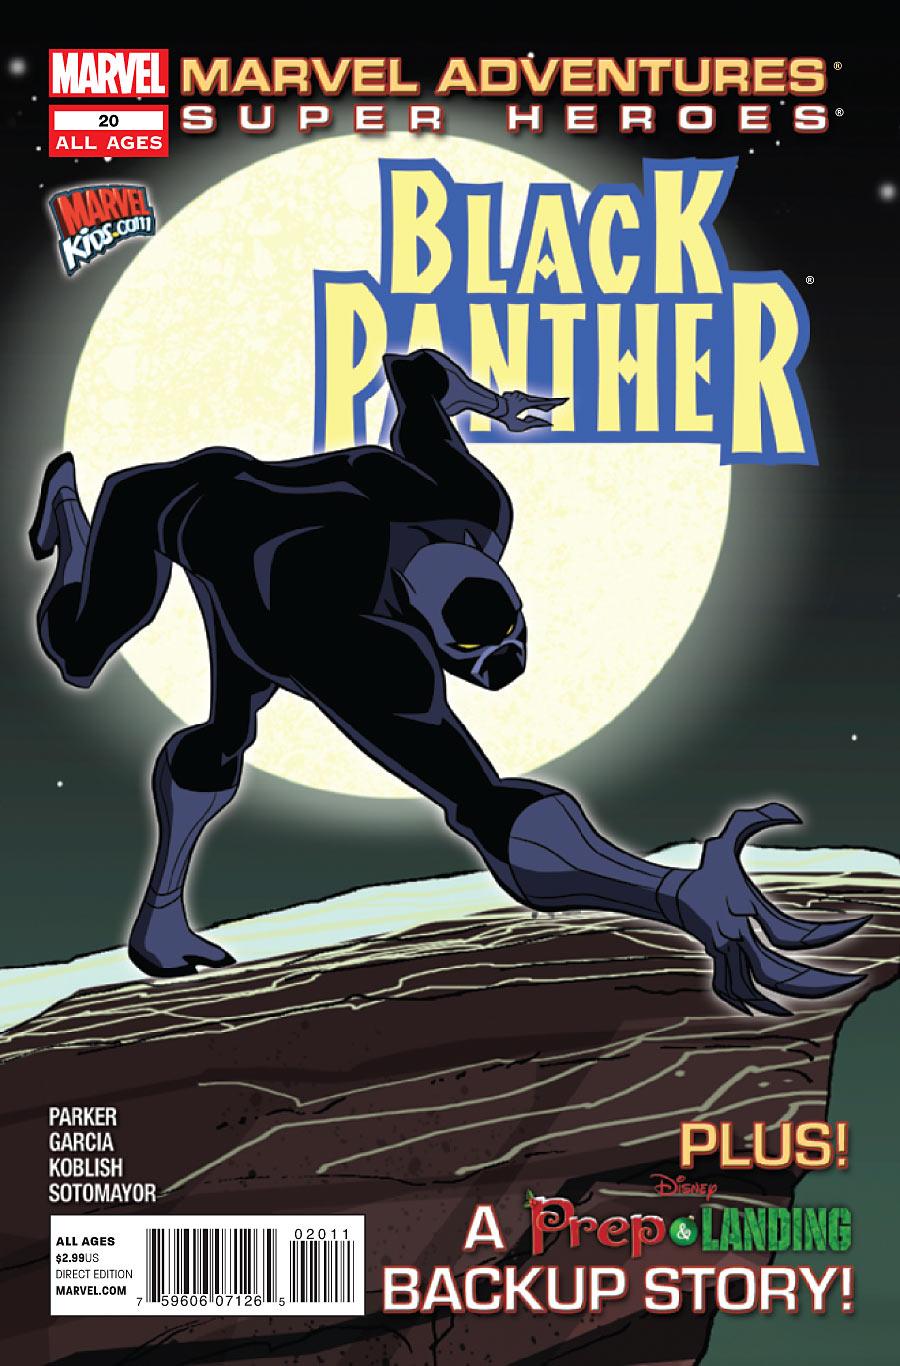 Marvel Adventures: Super Heroes Vol 2 20